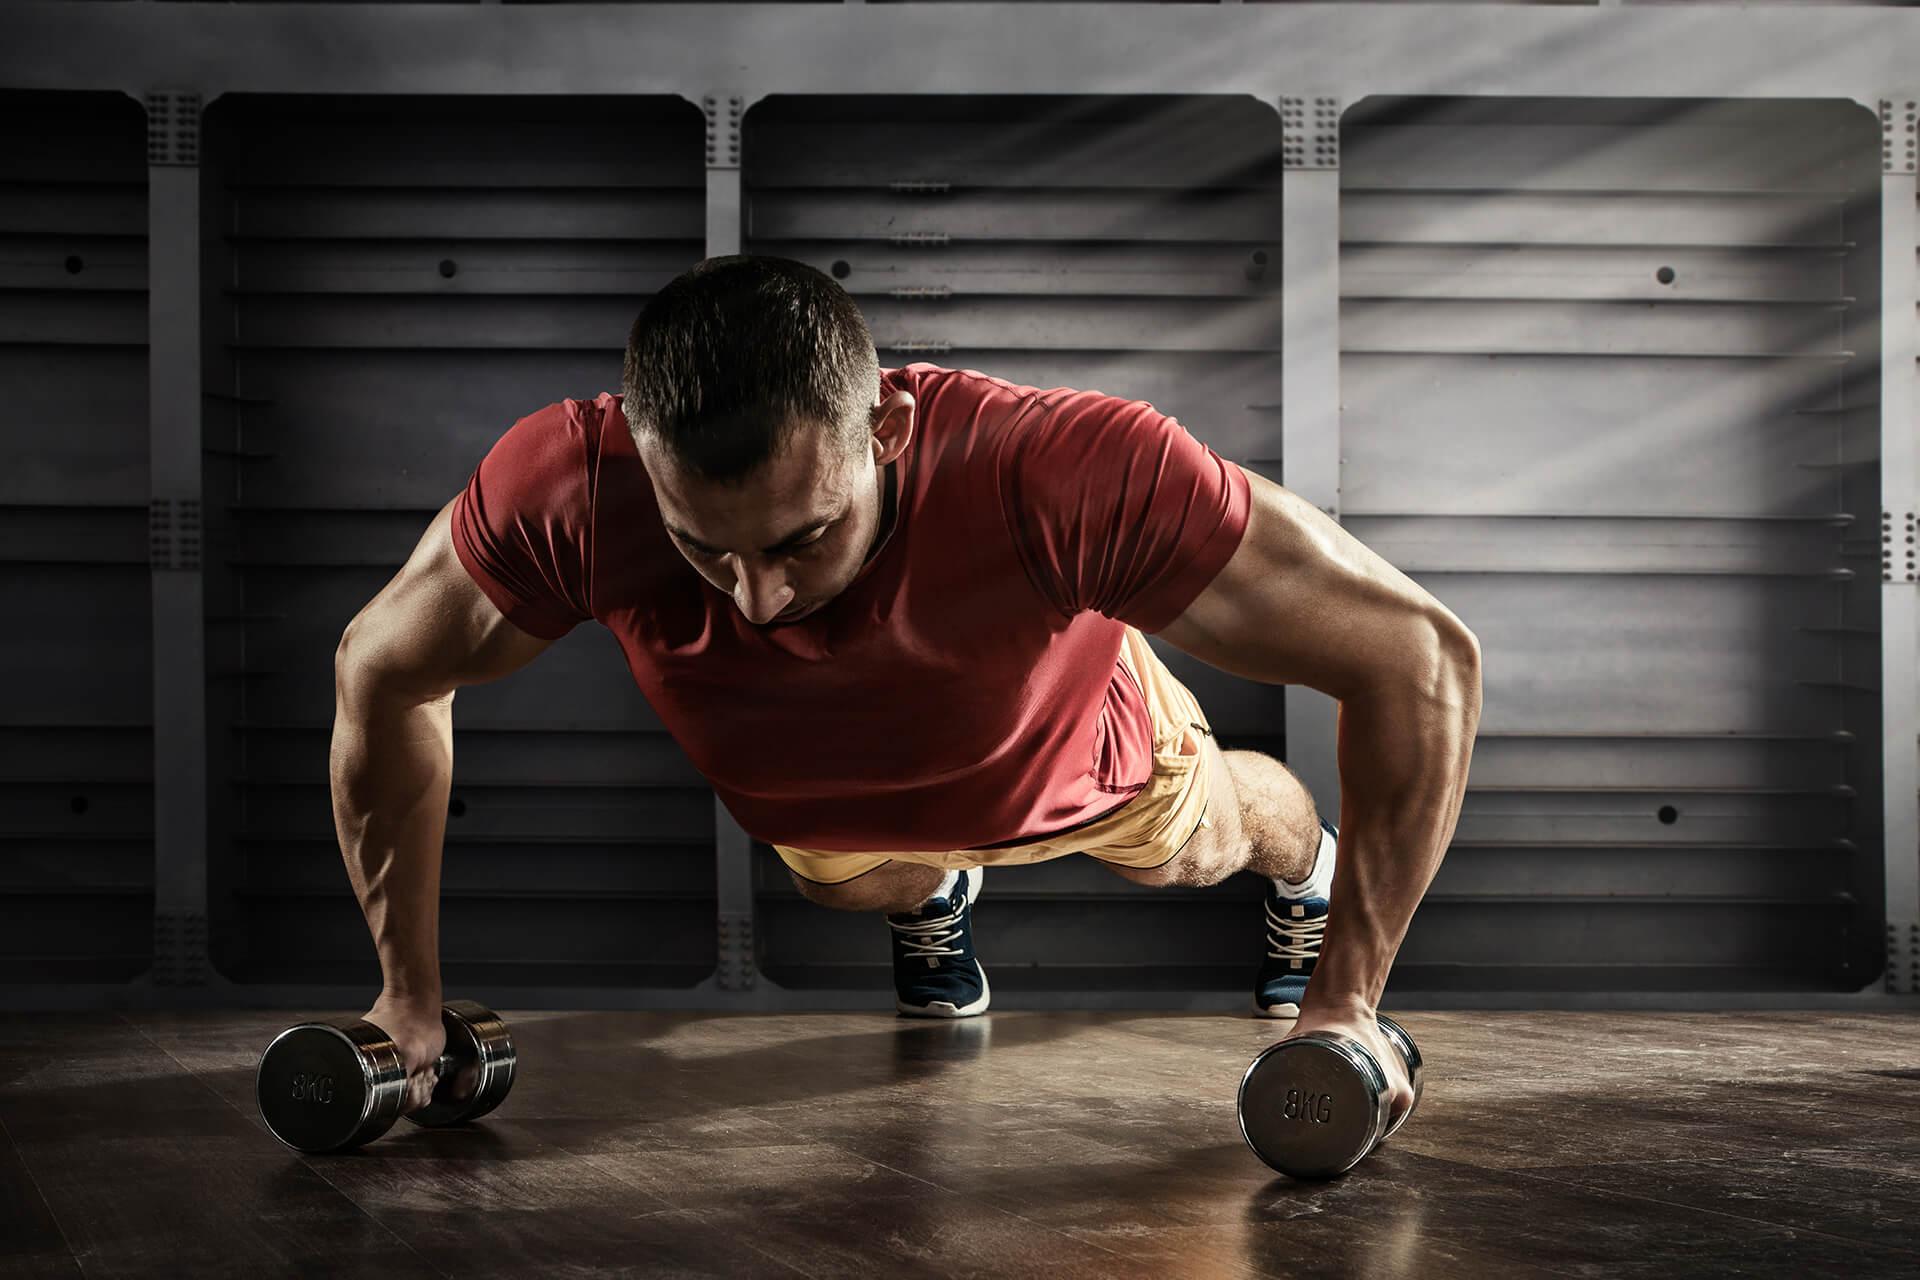 Frau Fitness Diät erhöhen Muskelmasse